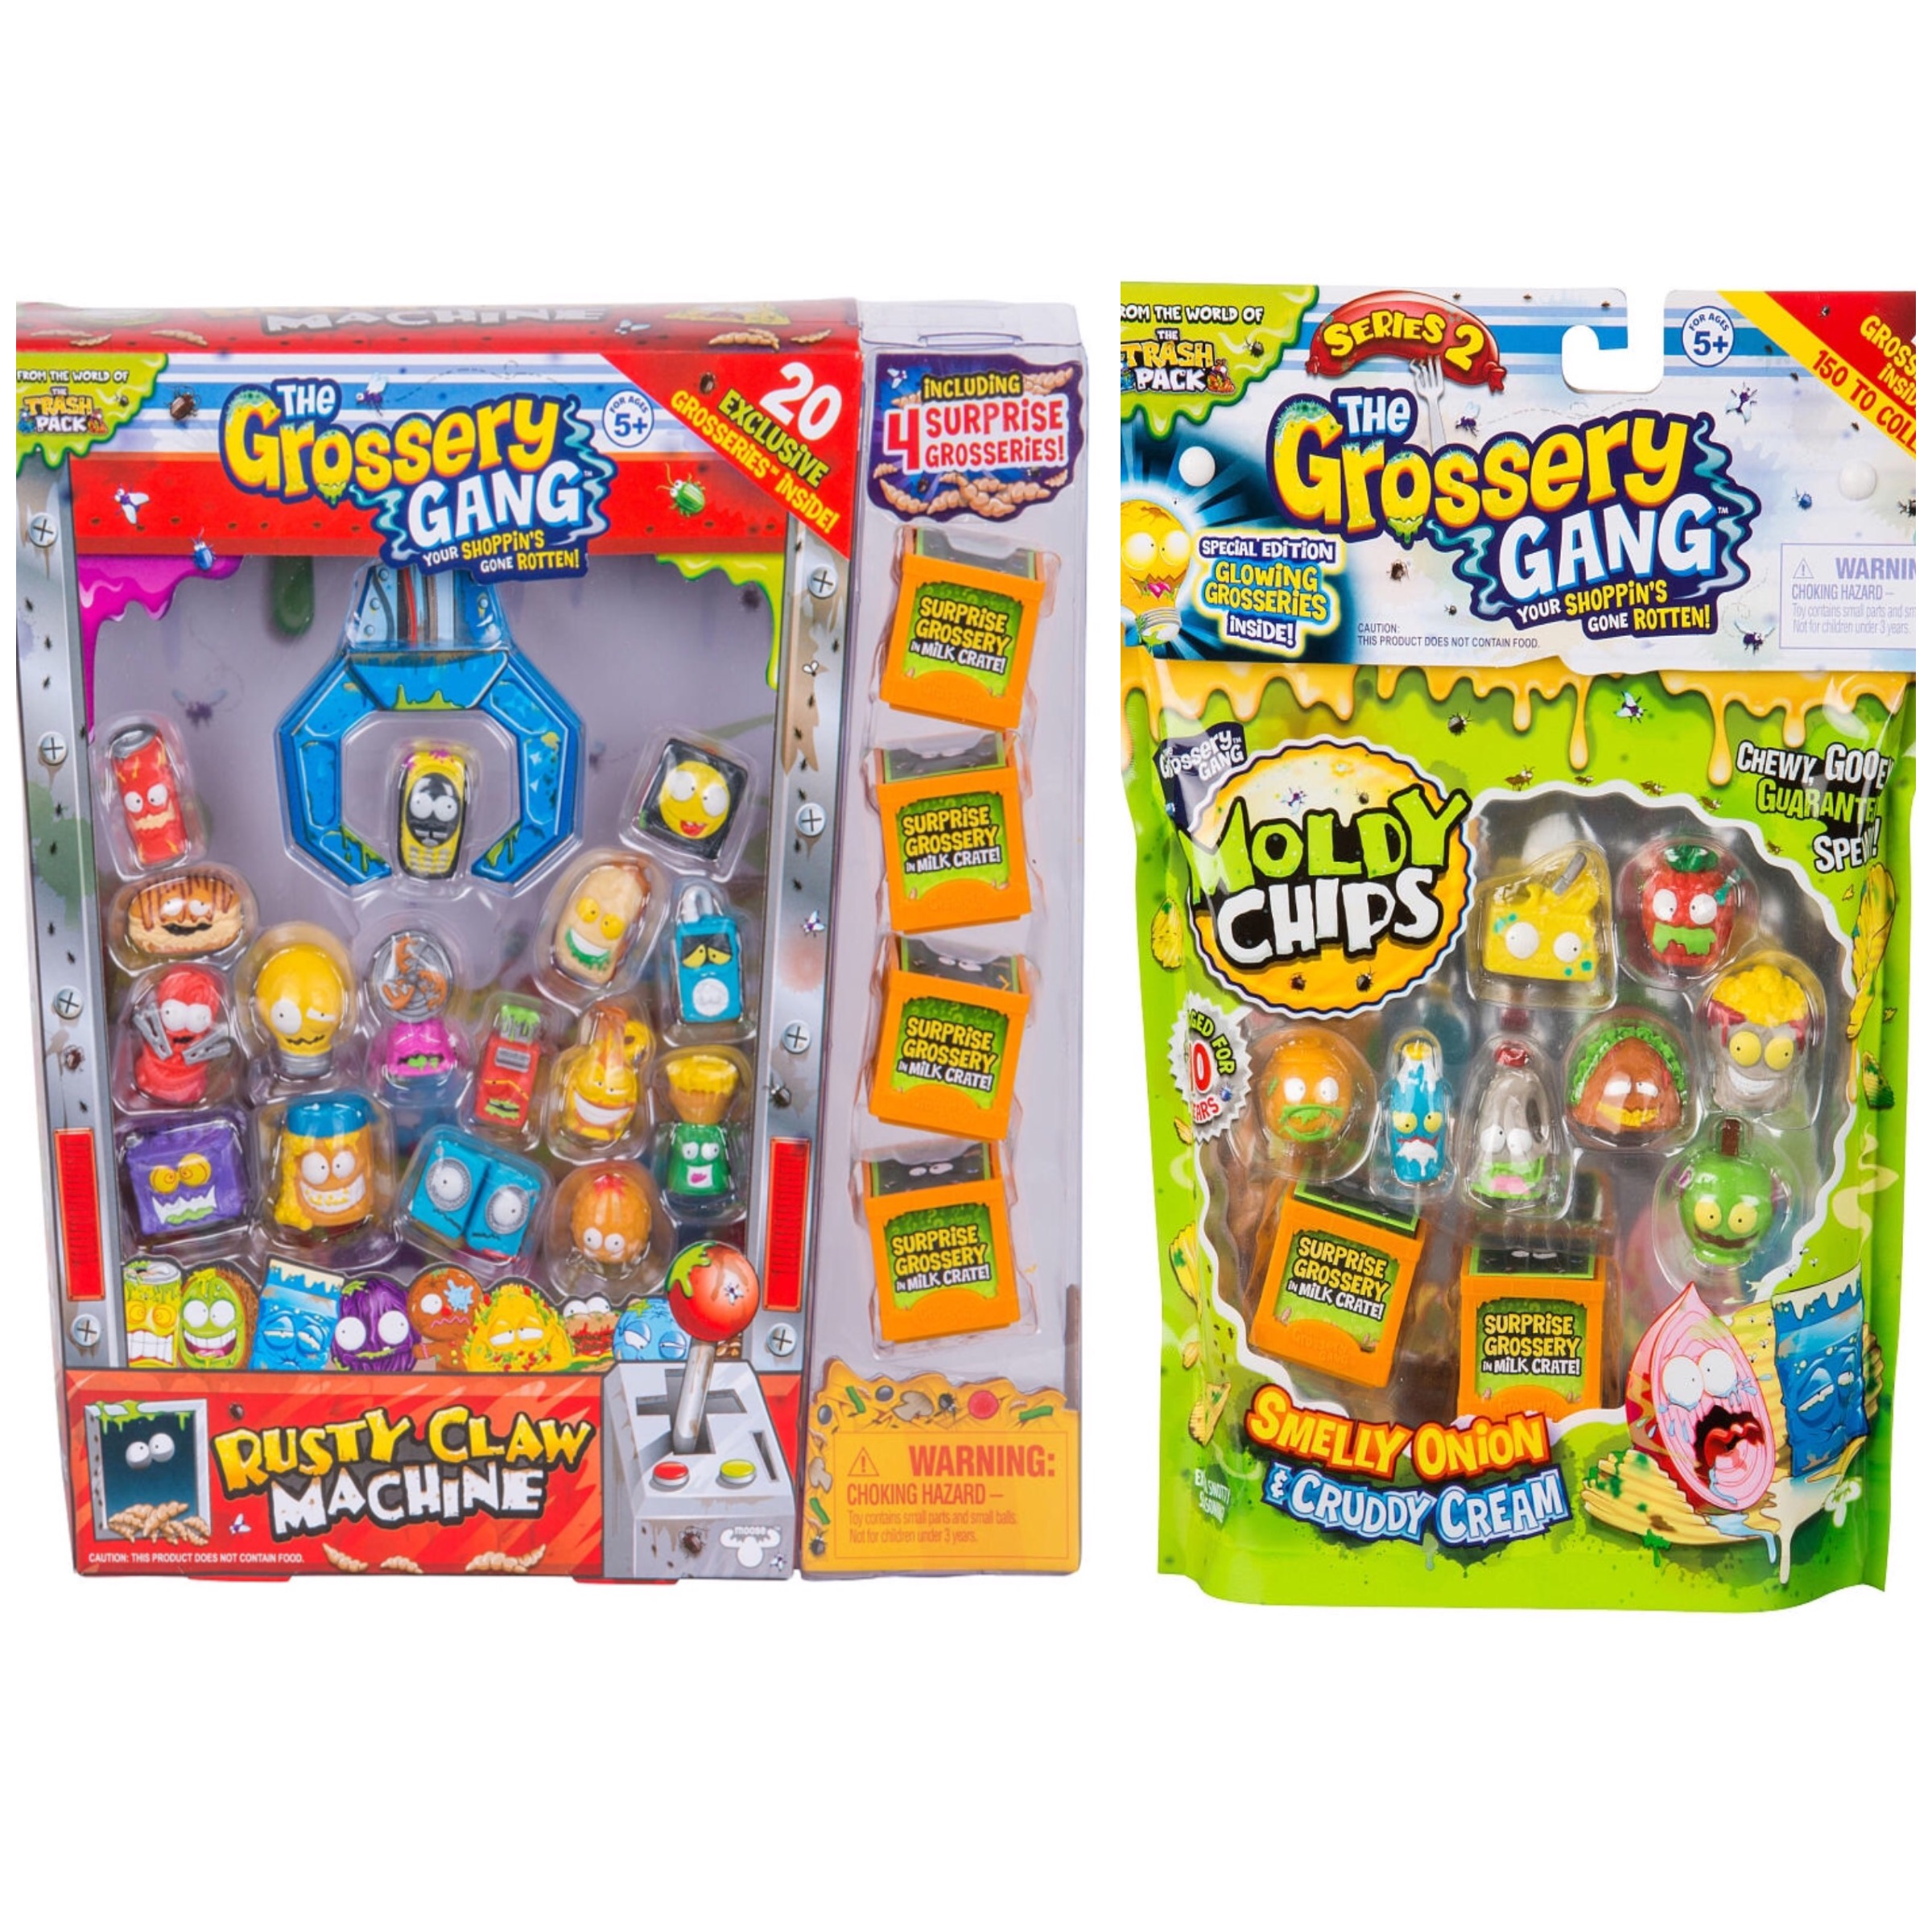 The Grossery Gang Bundle Season 2 Rusty Claw Machine Pack...